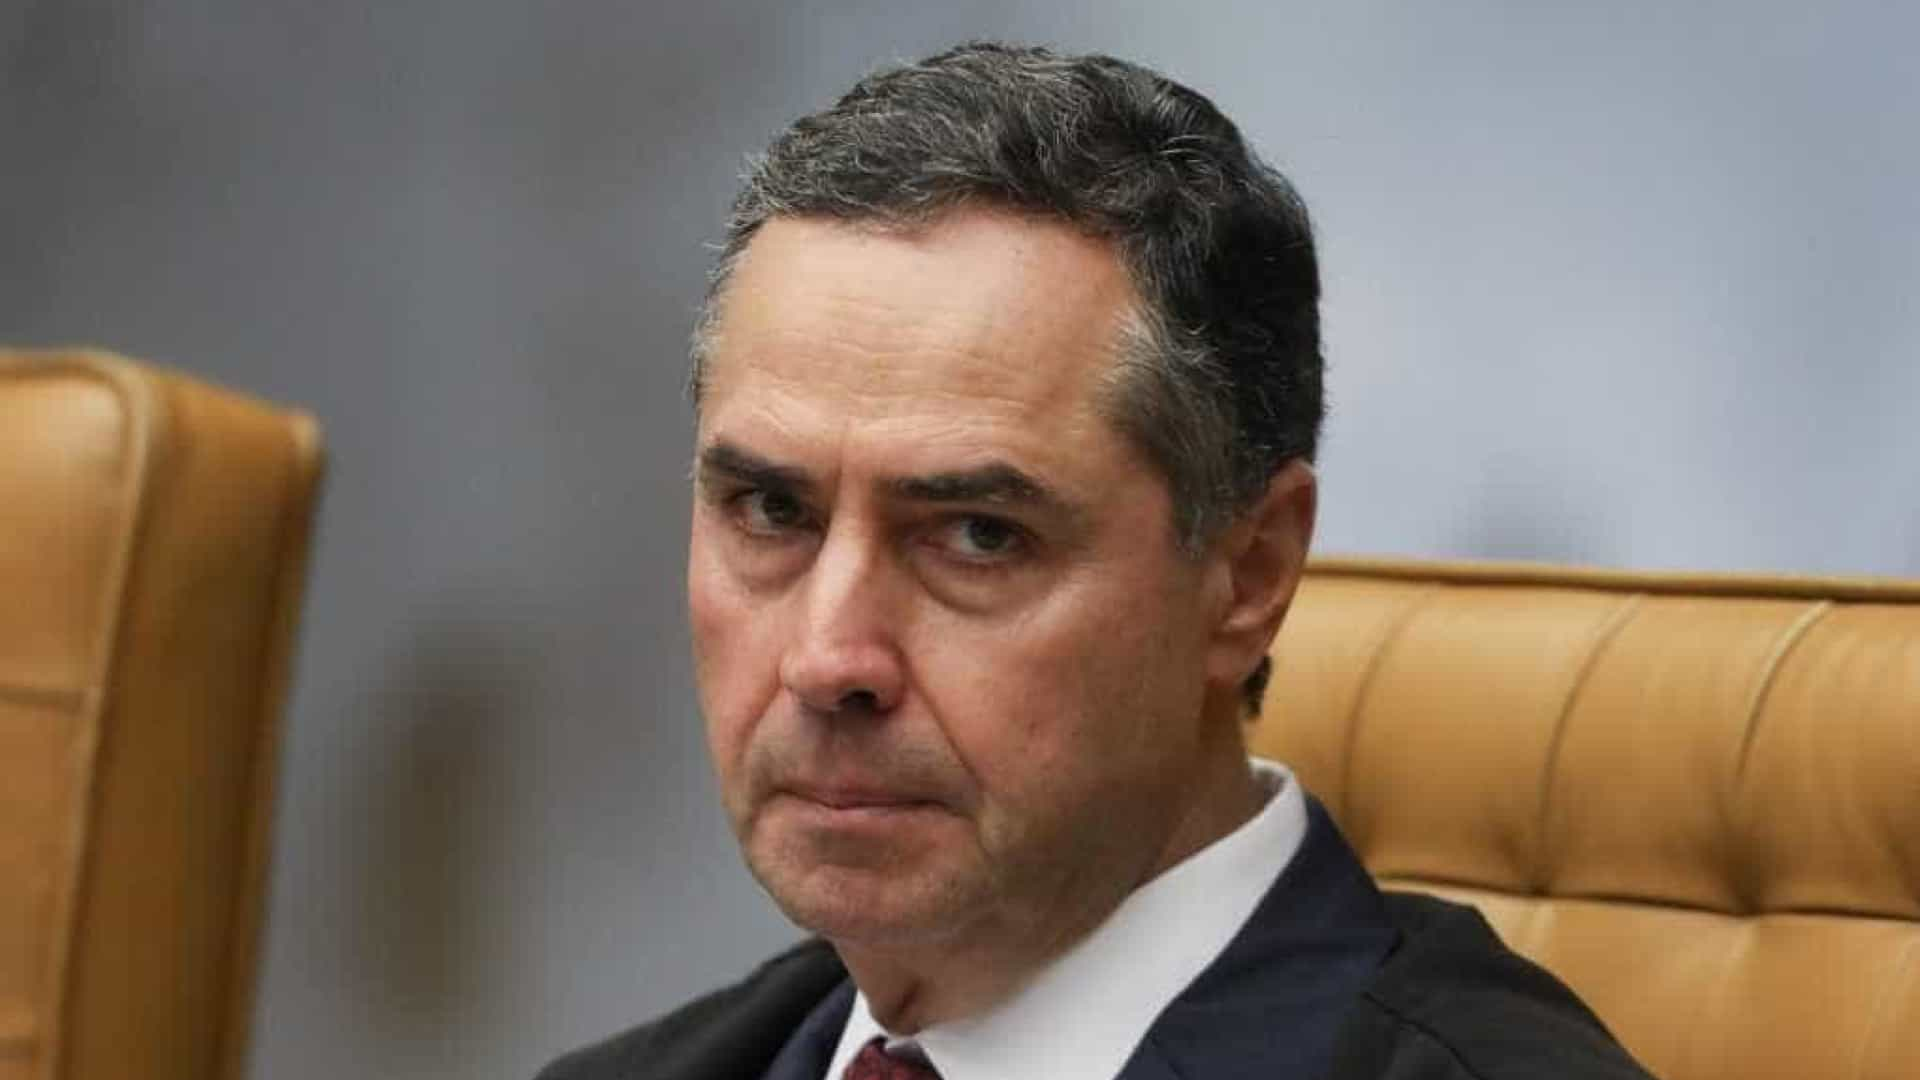 Barroso agora associa pane do TSE à falta de testes e levanta suspeita sobre milícias digitais